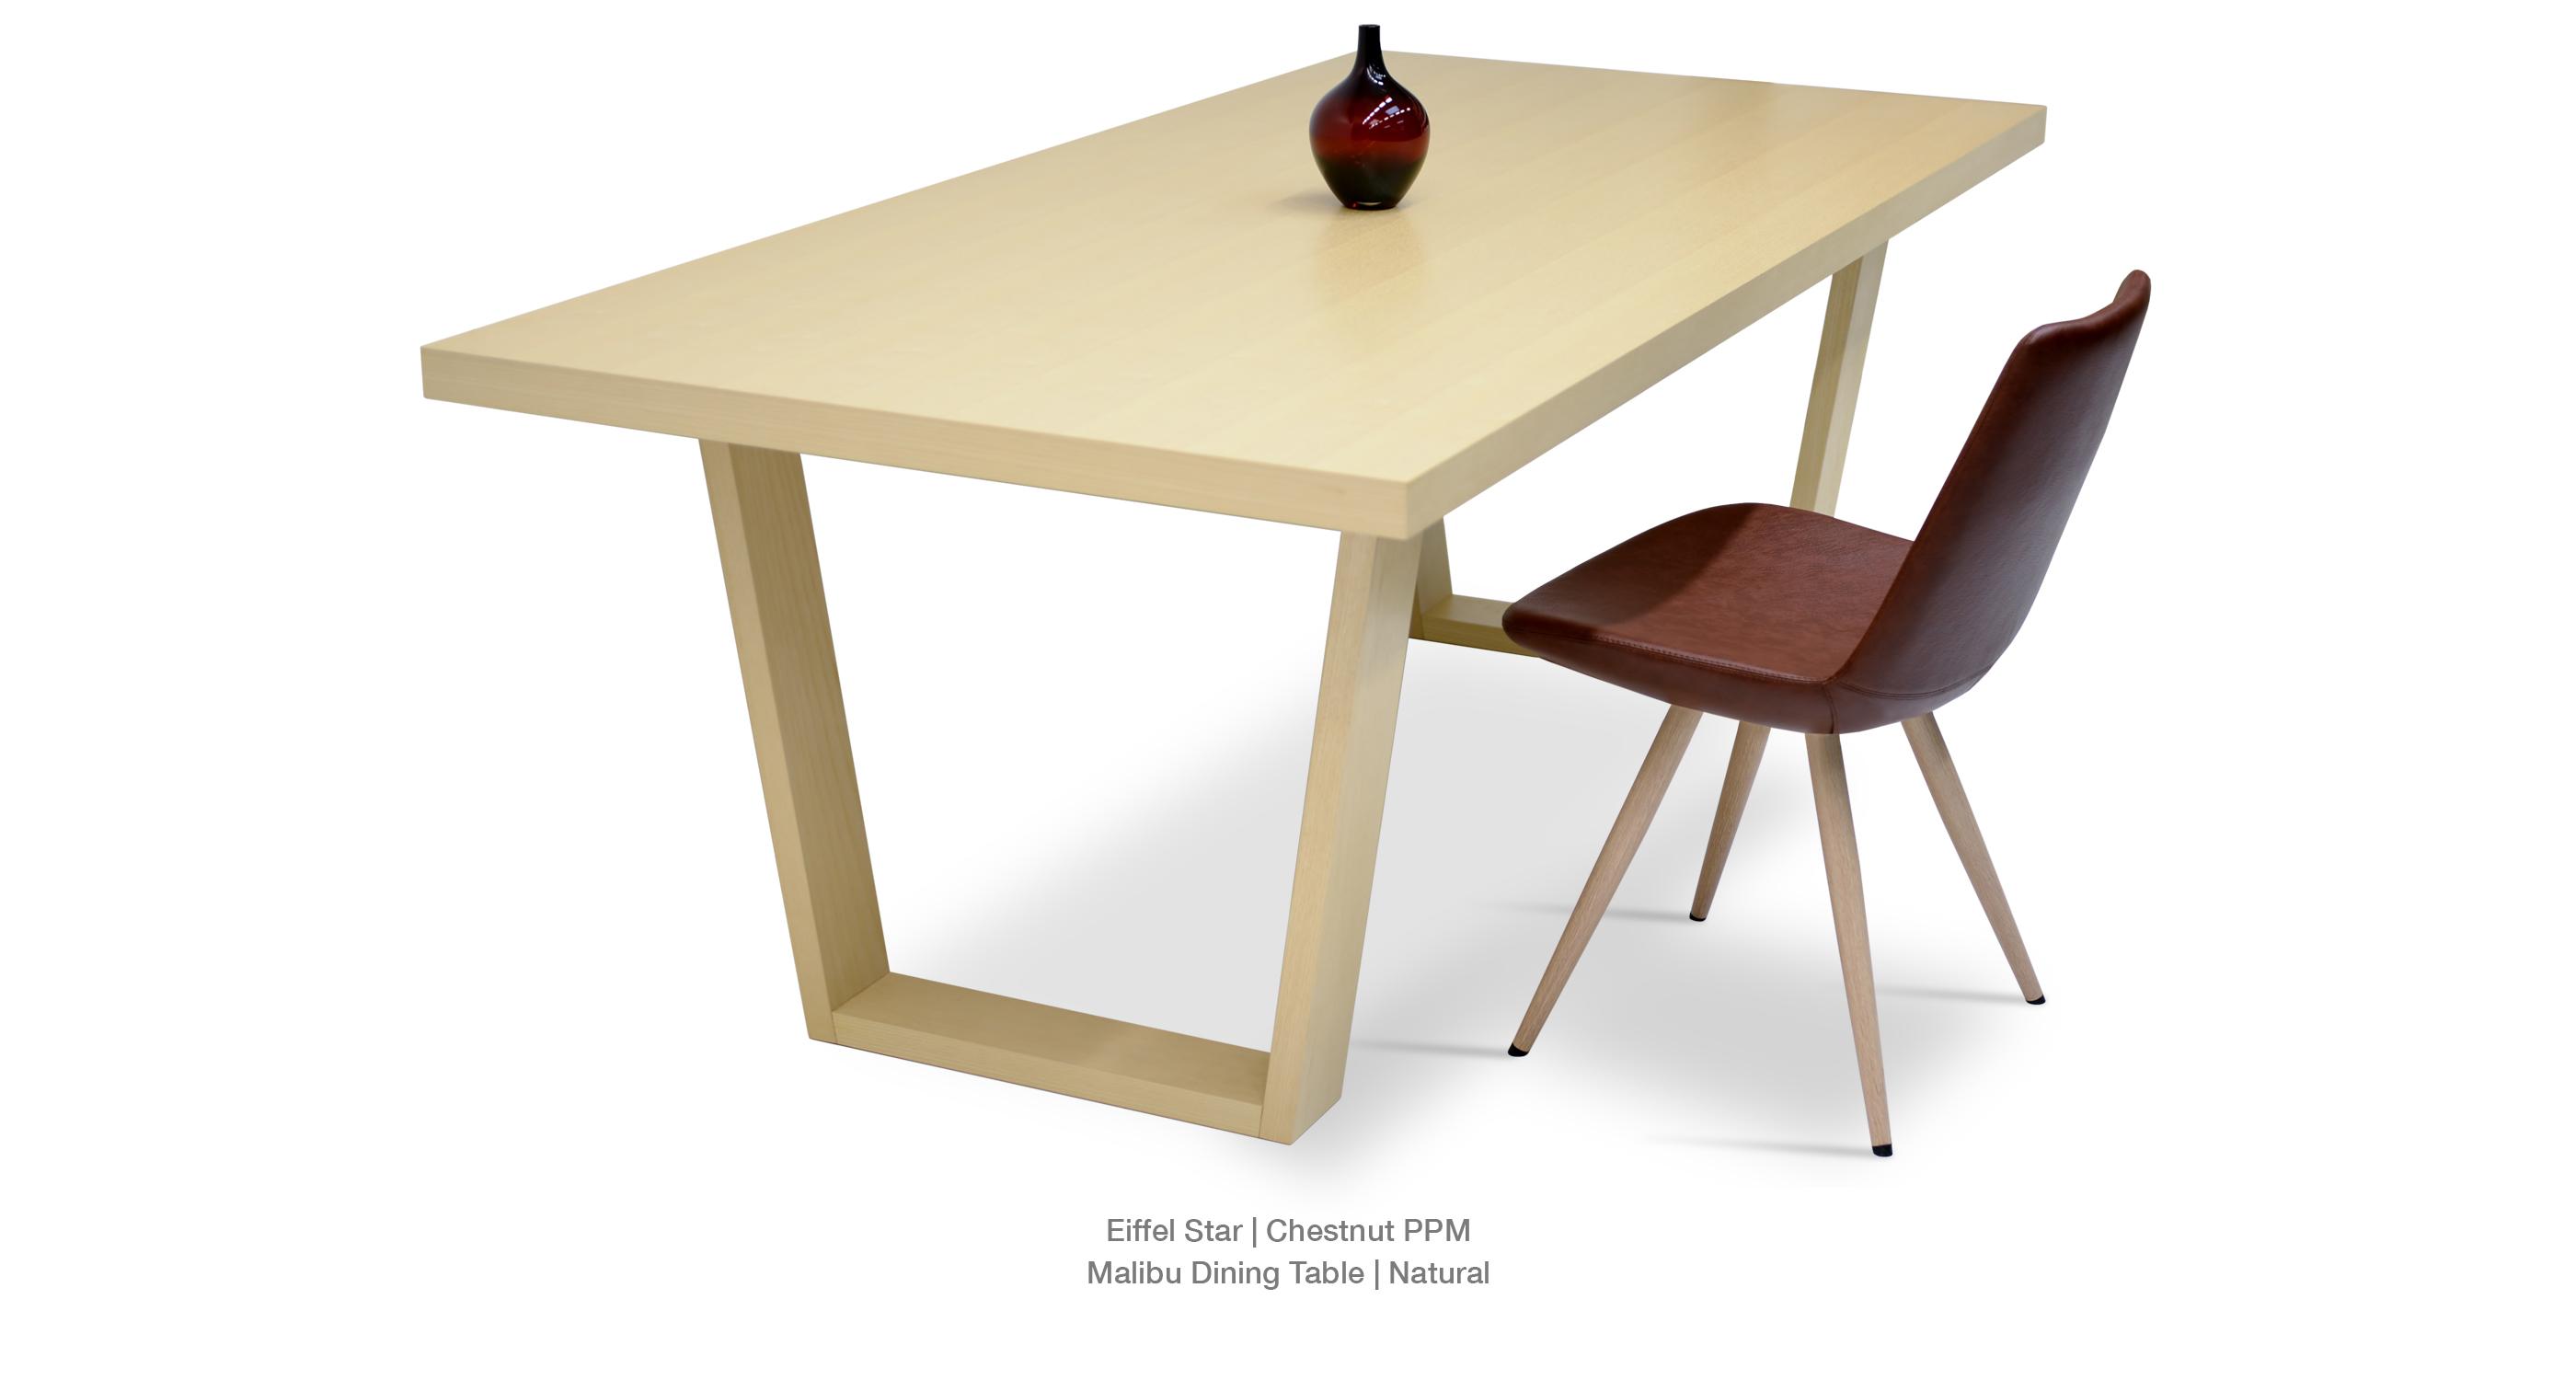 Sensational Eiffel Star Contemporary Dining Chair Sohoconcept Creativecarmelina Interior Chair Design Creativecarmelinacom